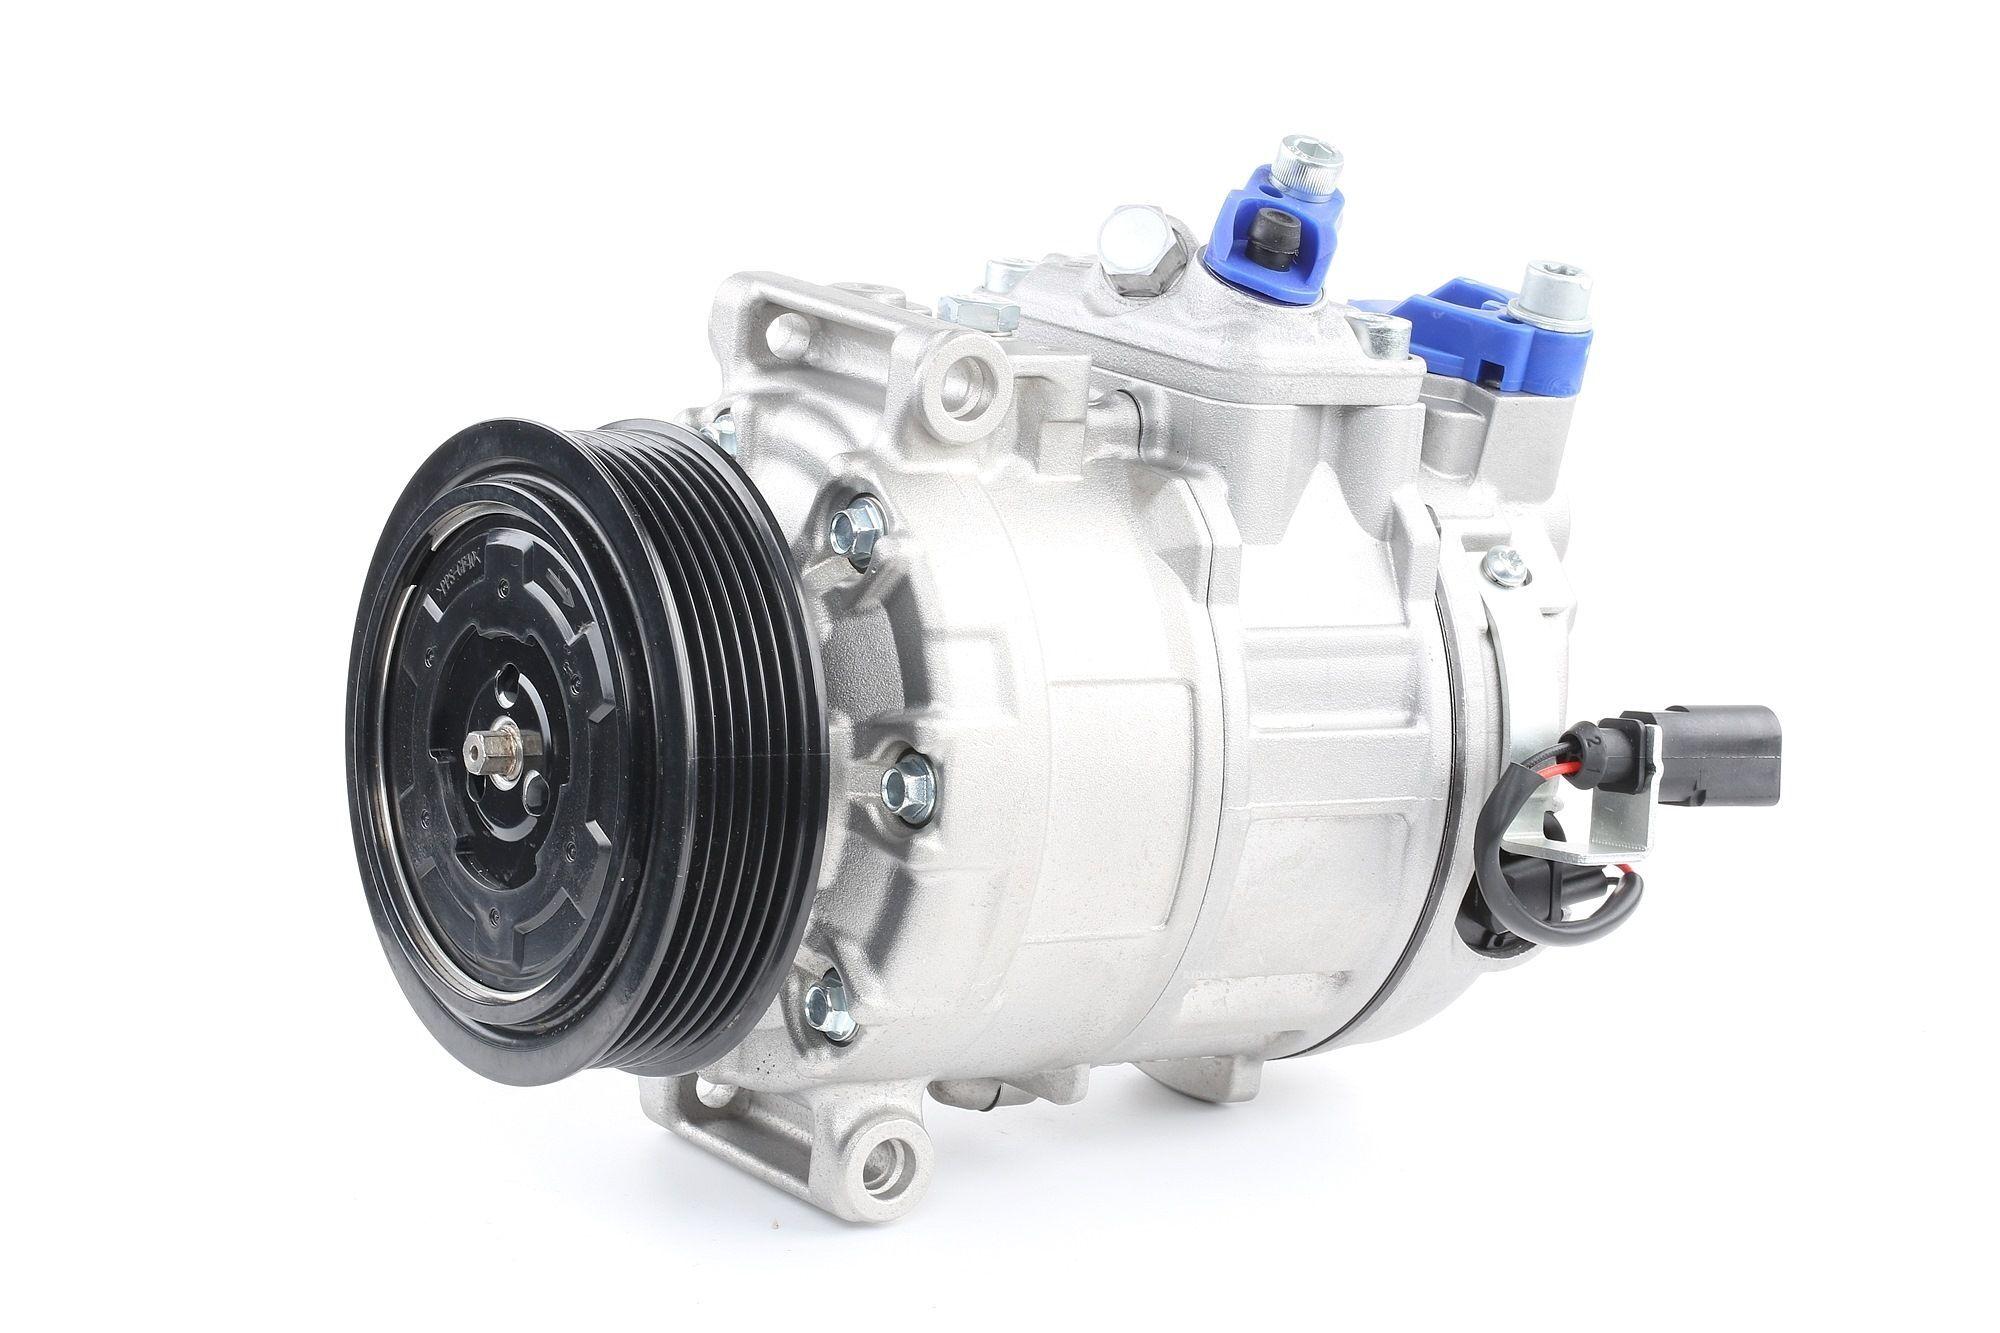 RIDEX Compresseur De Climatisation 447K0004 Compresseur De Clim,Compresseur, climatisation VW,AUDI,SKODA,GOLF V 1K1,TOURAN 1T1, 1T2,GOLF VI 5K1